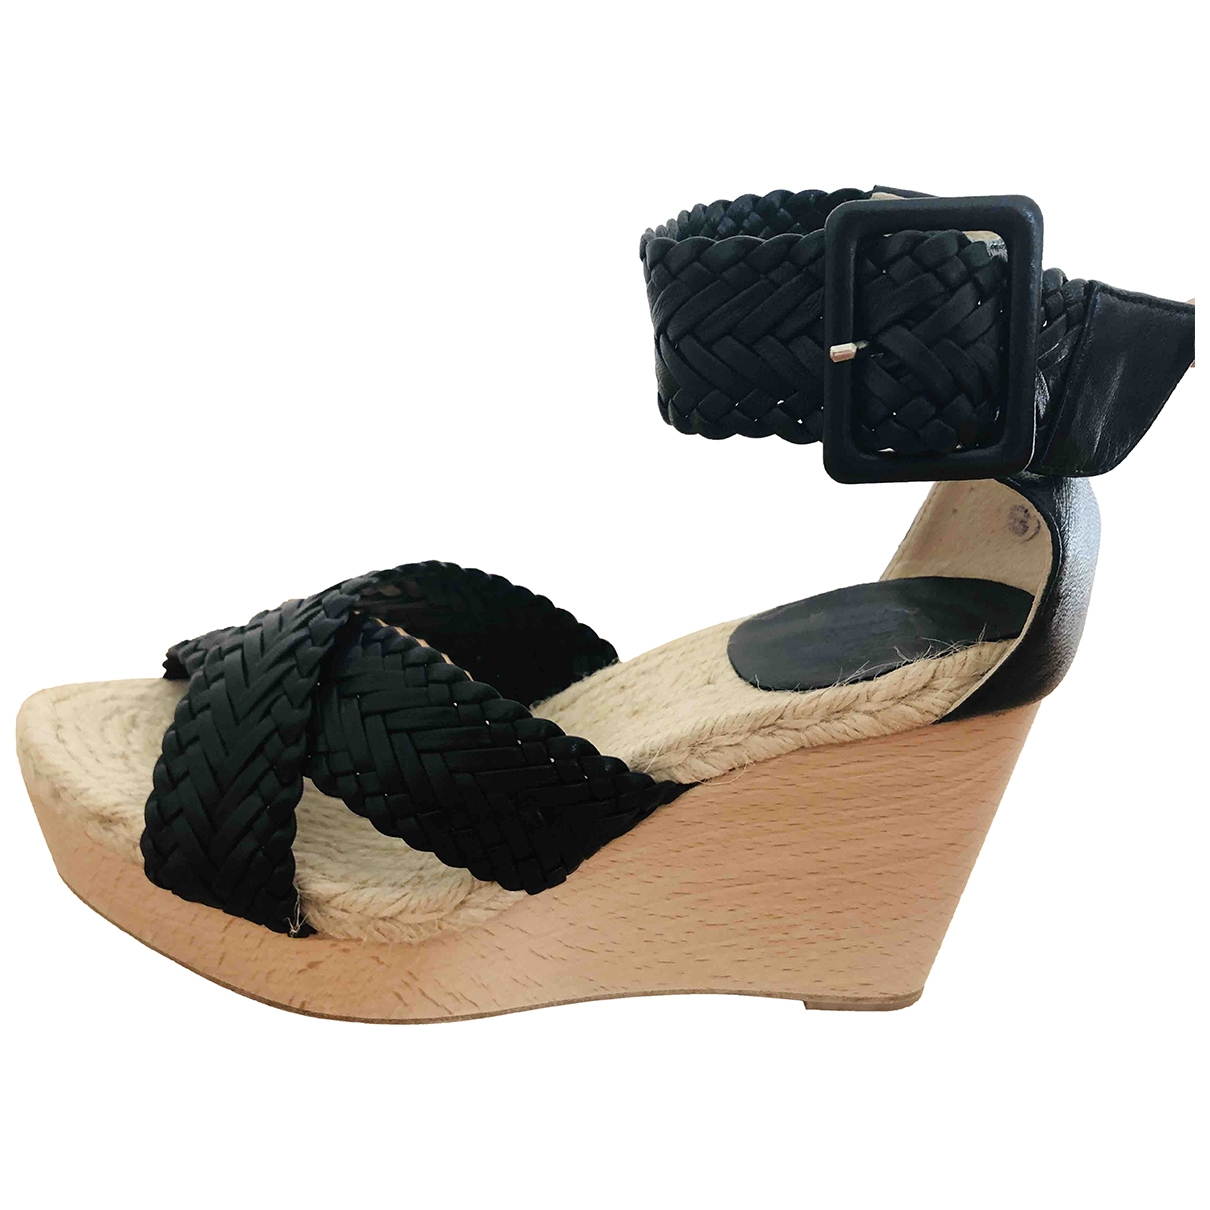 Hermès \N Black Leather Sandals for Women 37 EU